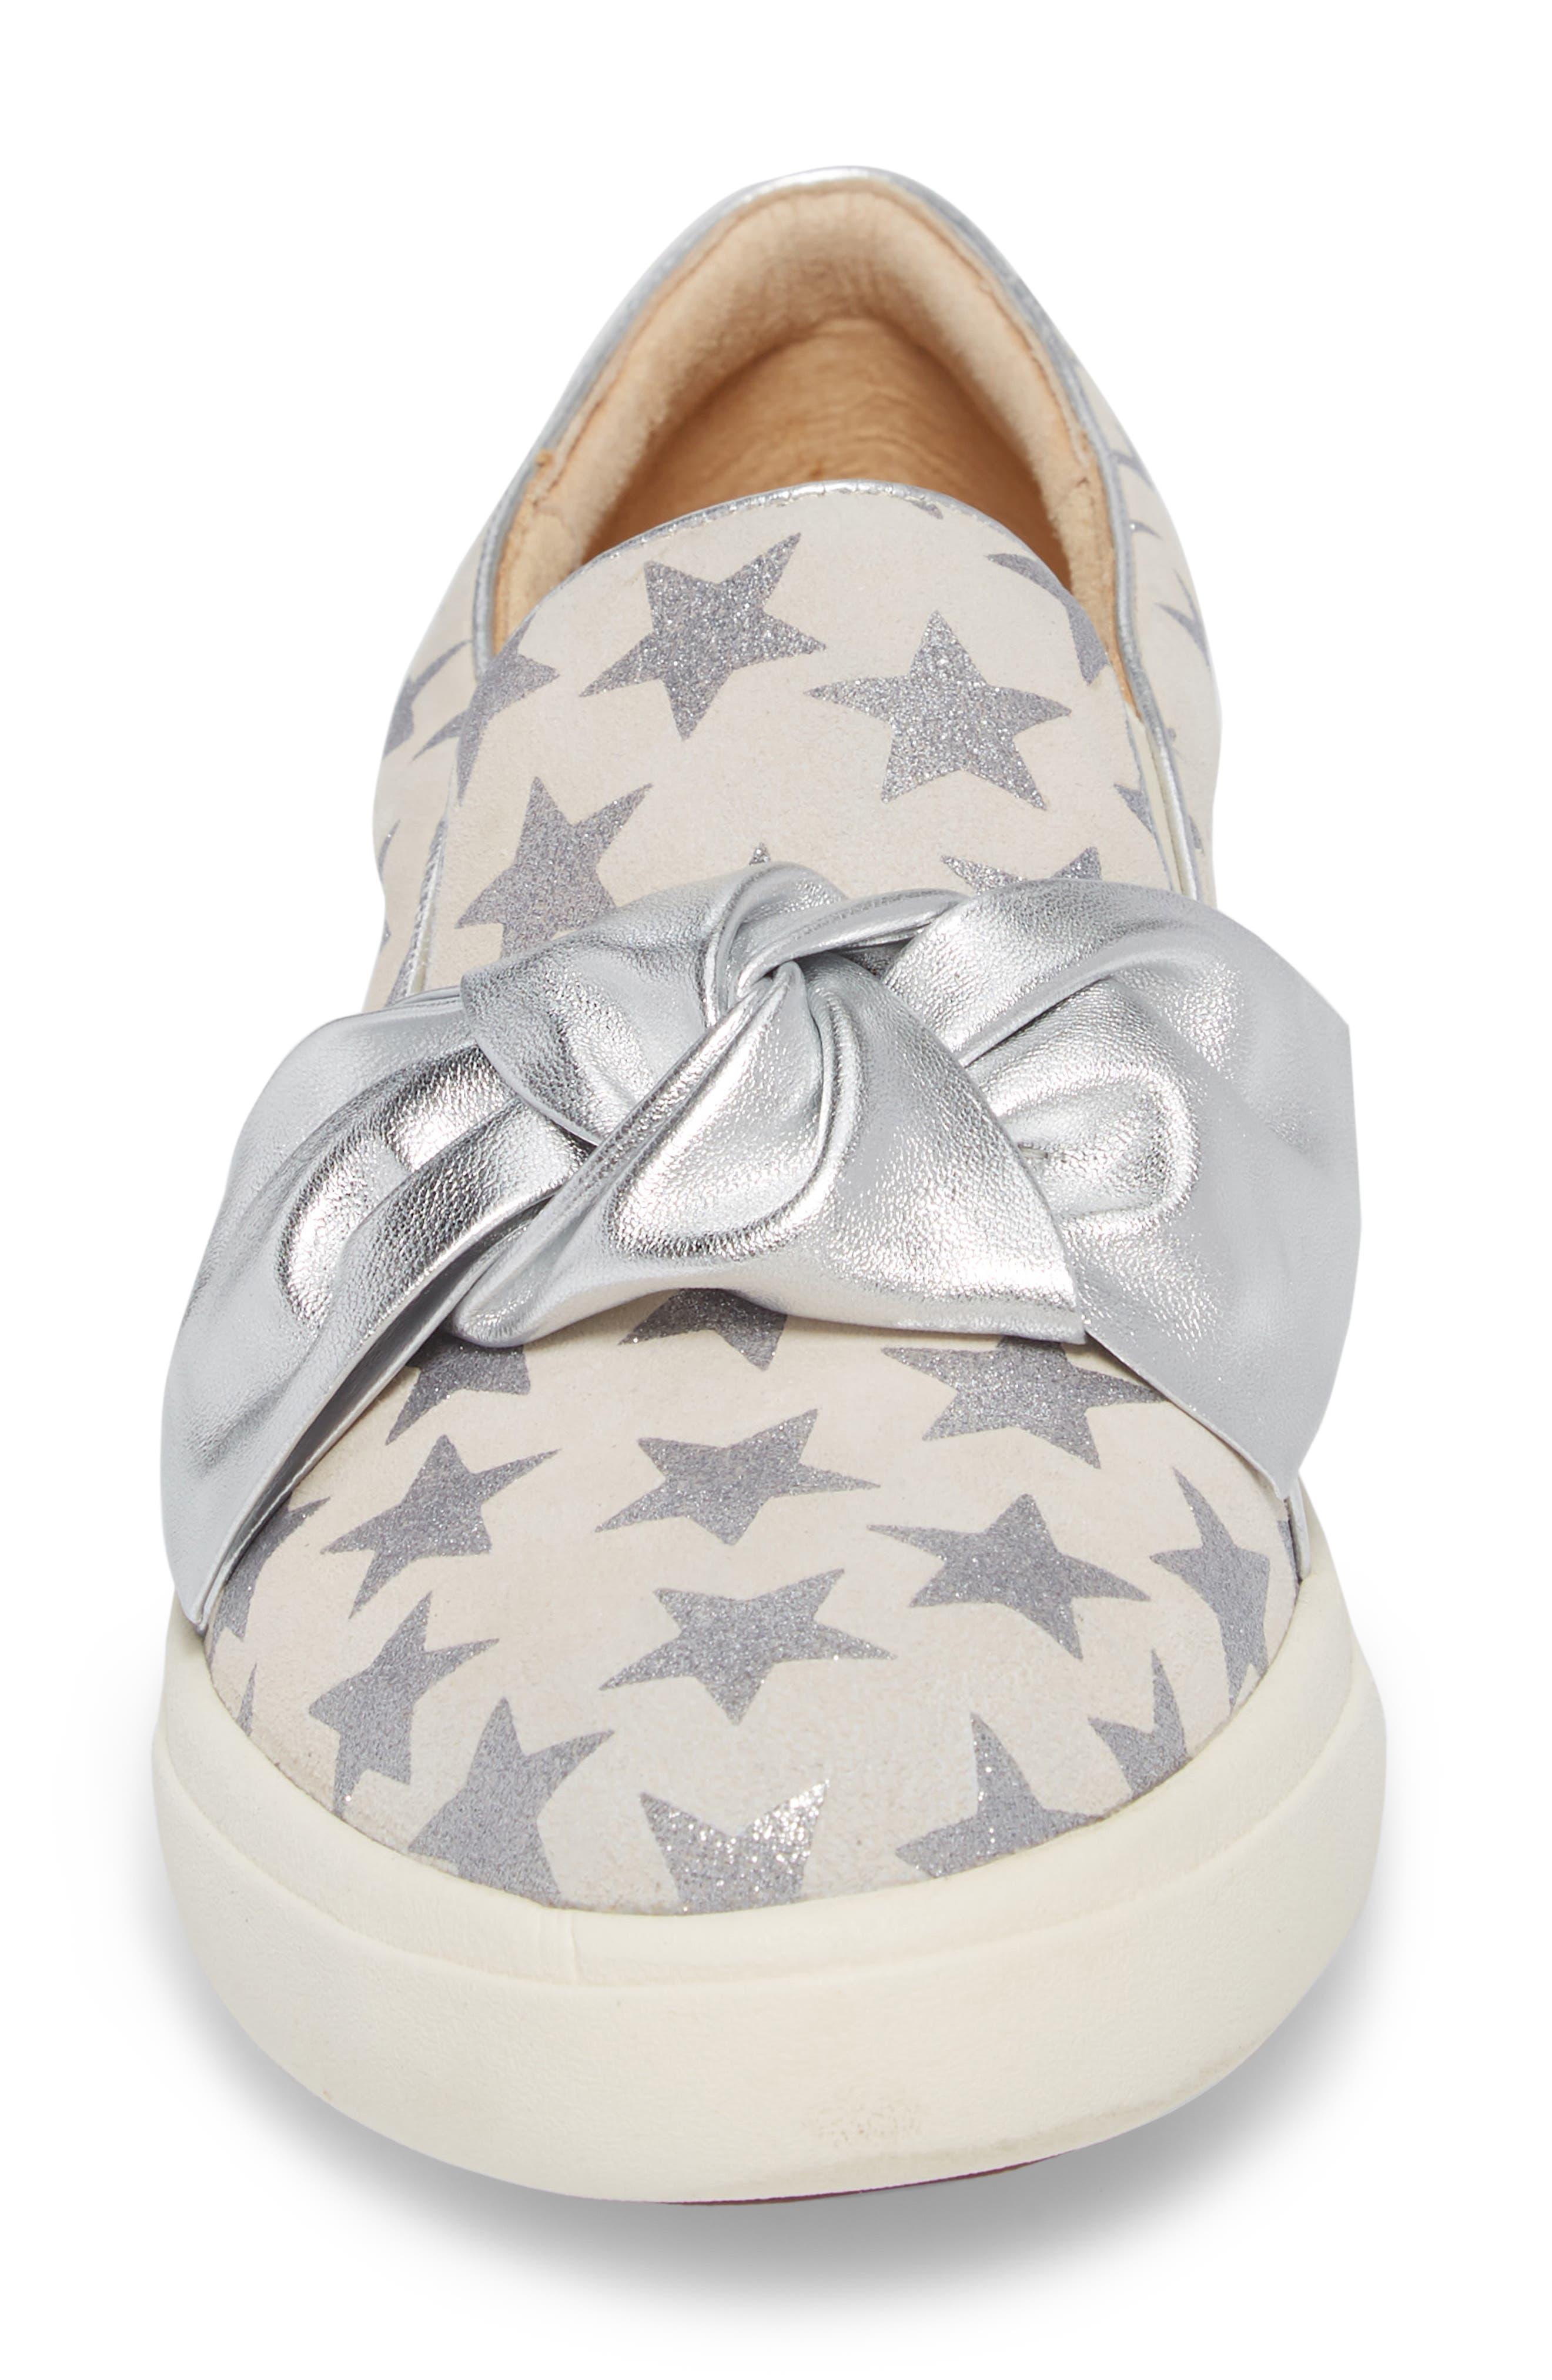 Odelet Slip-On Sneaker,                             Alternate thumbnail 4, color,                             Beige/ Silver Suede